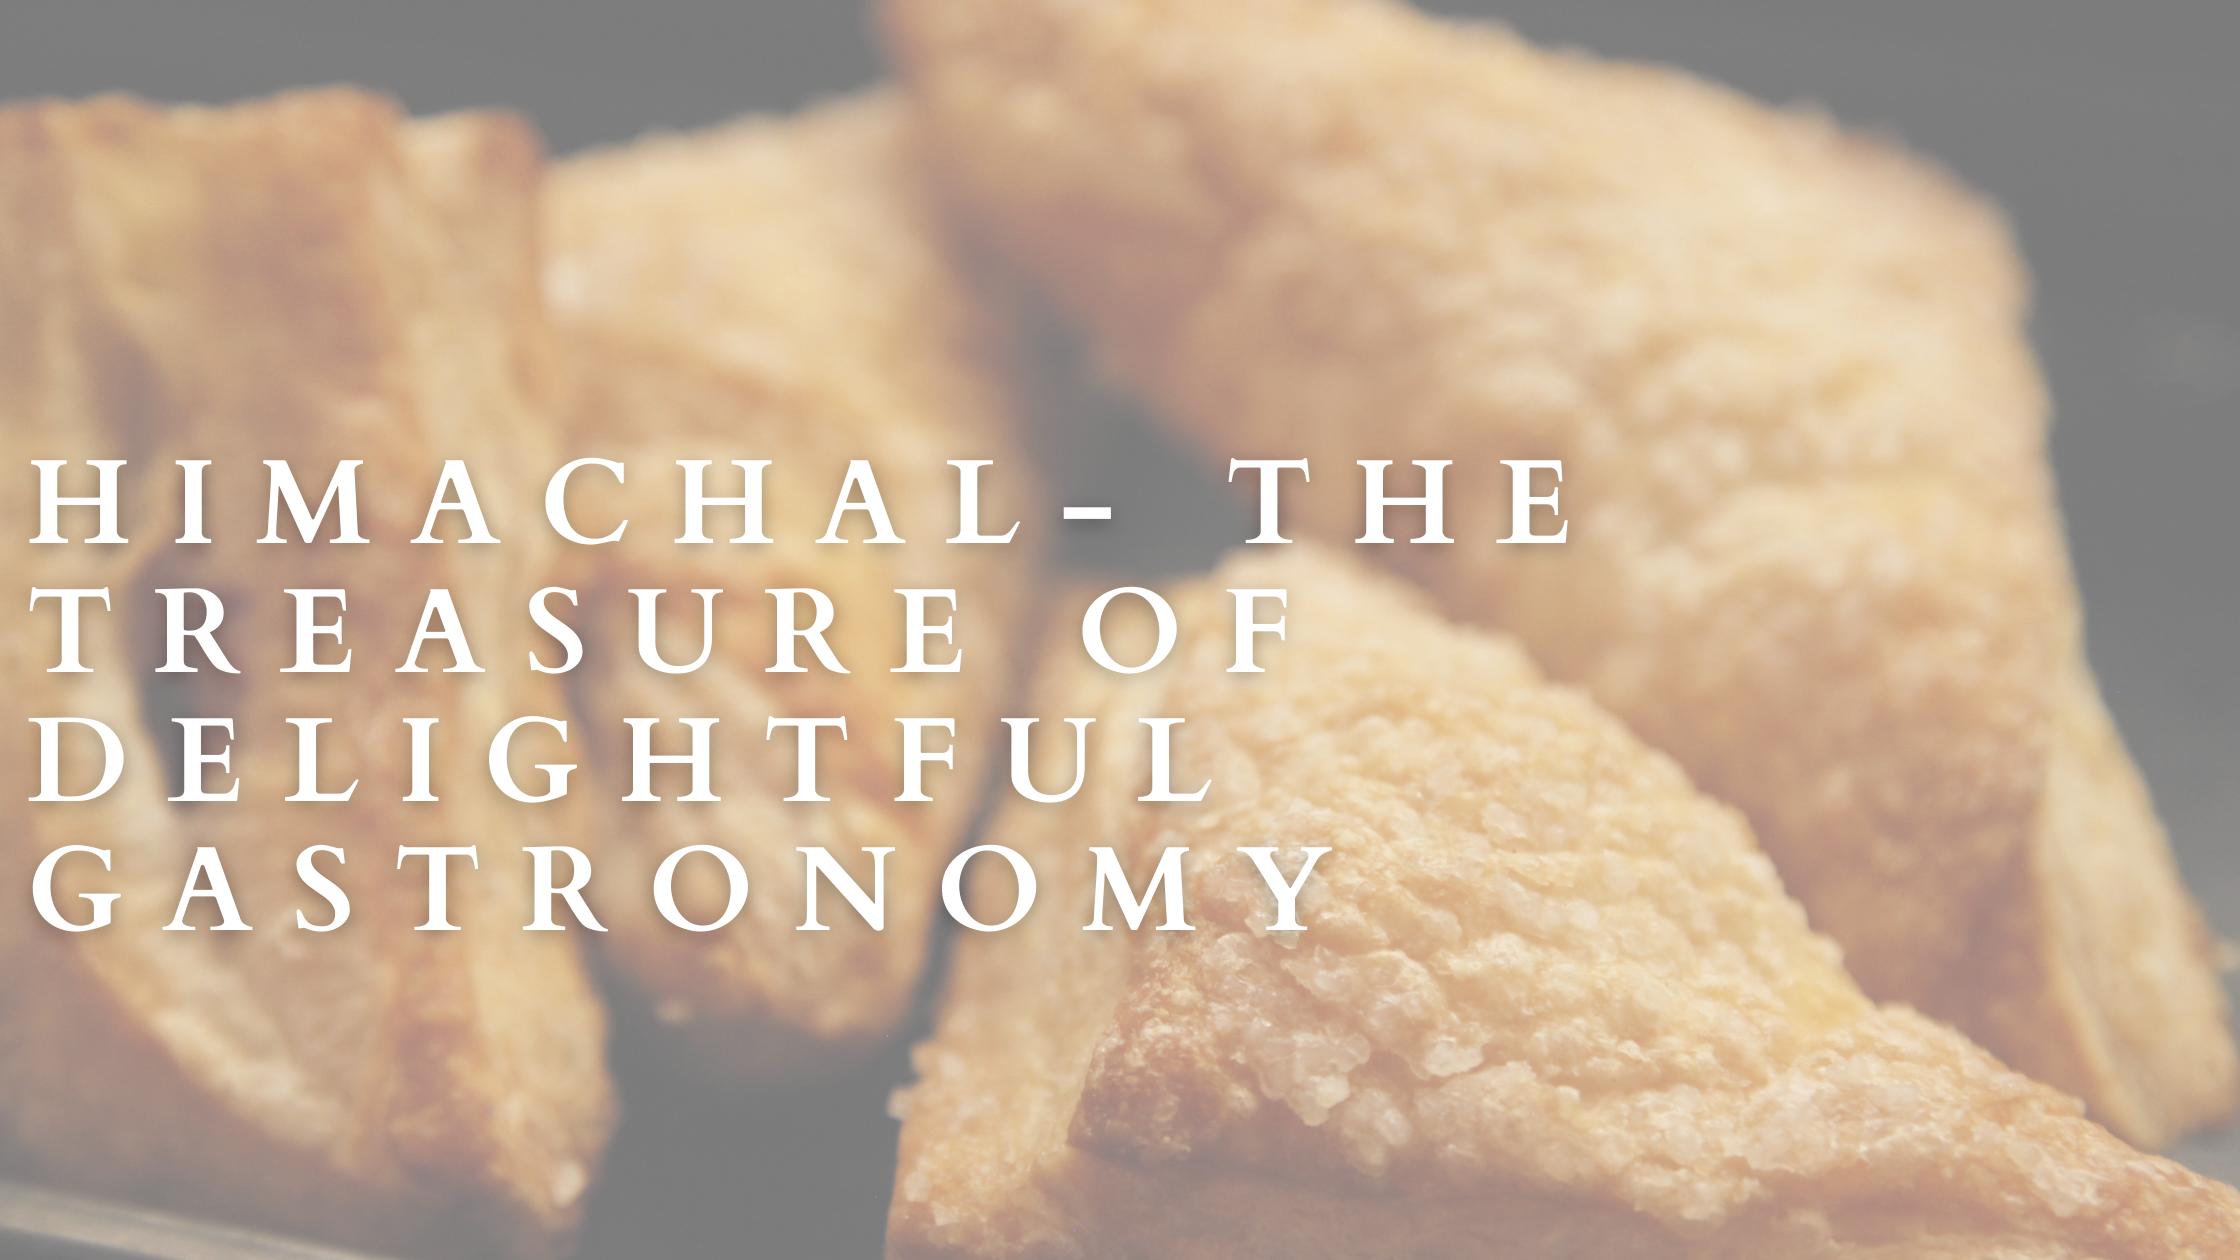 Find the Treasure of delightful Gastronomy in Himachal Pradesh